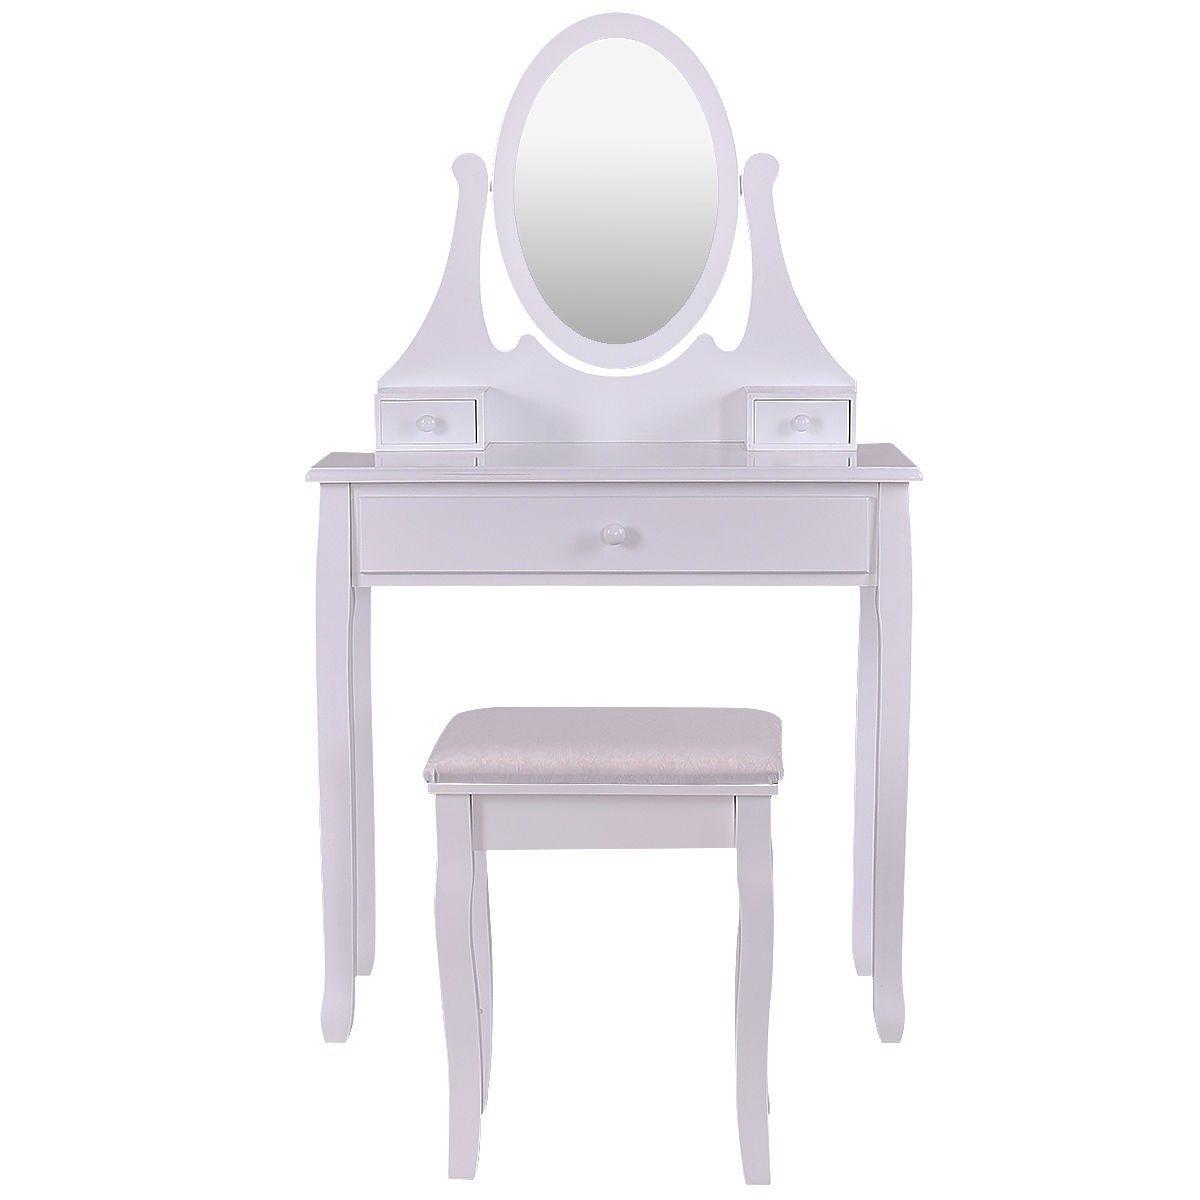 Vanity Wooden Makeup Dressing Table Stool Set Dressing Table With Stool Dressing Table Set Makeup Dressing Table